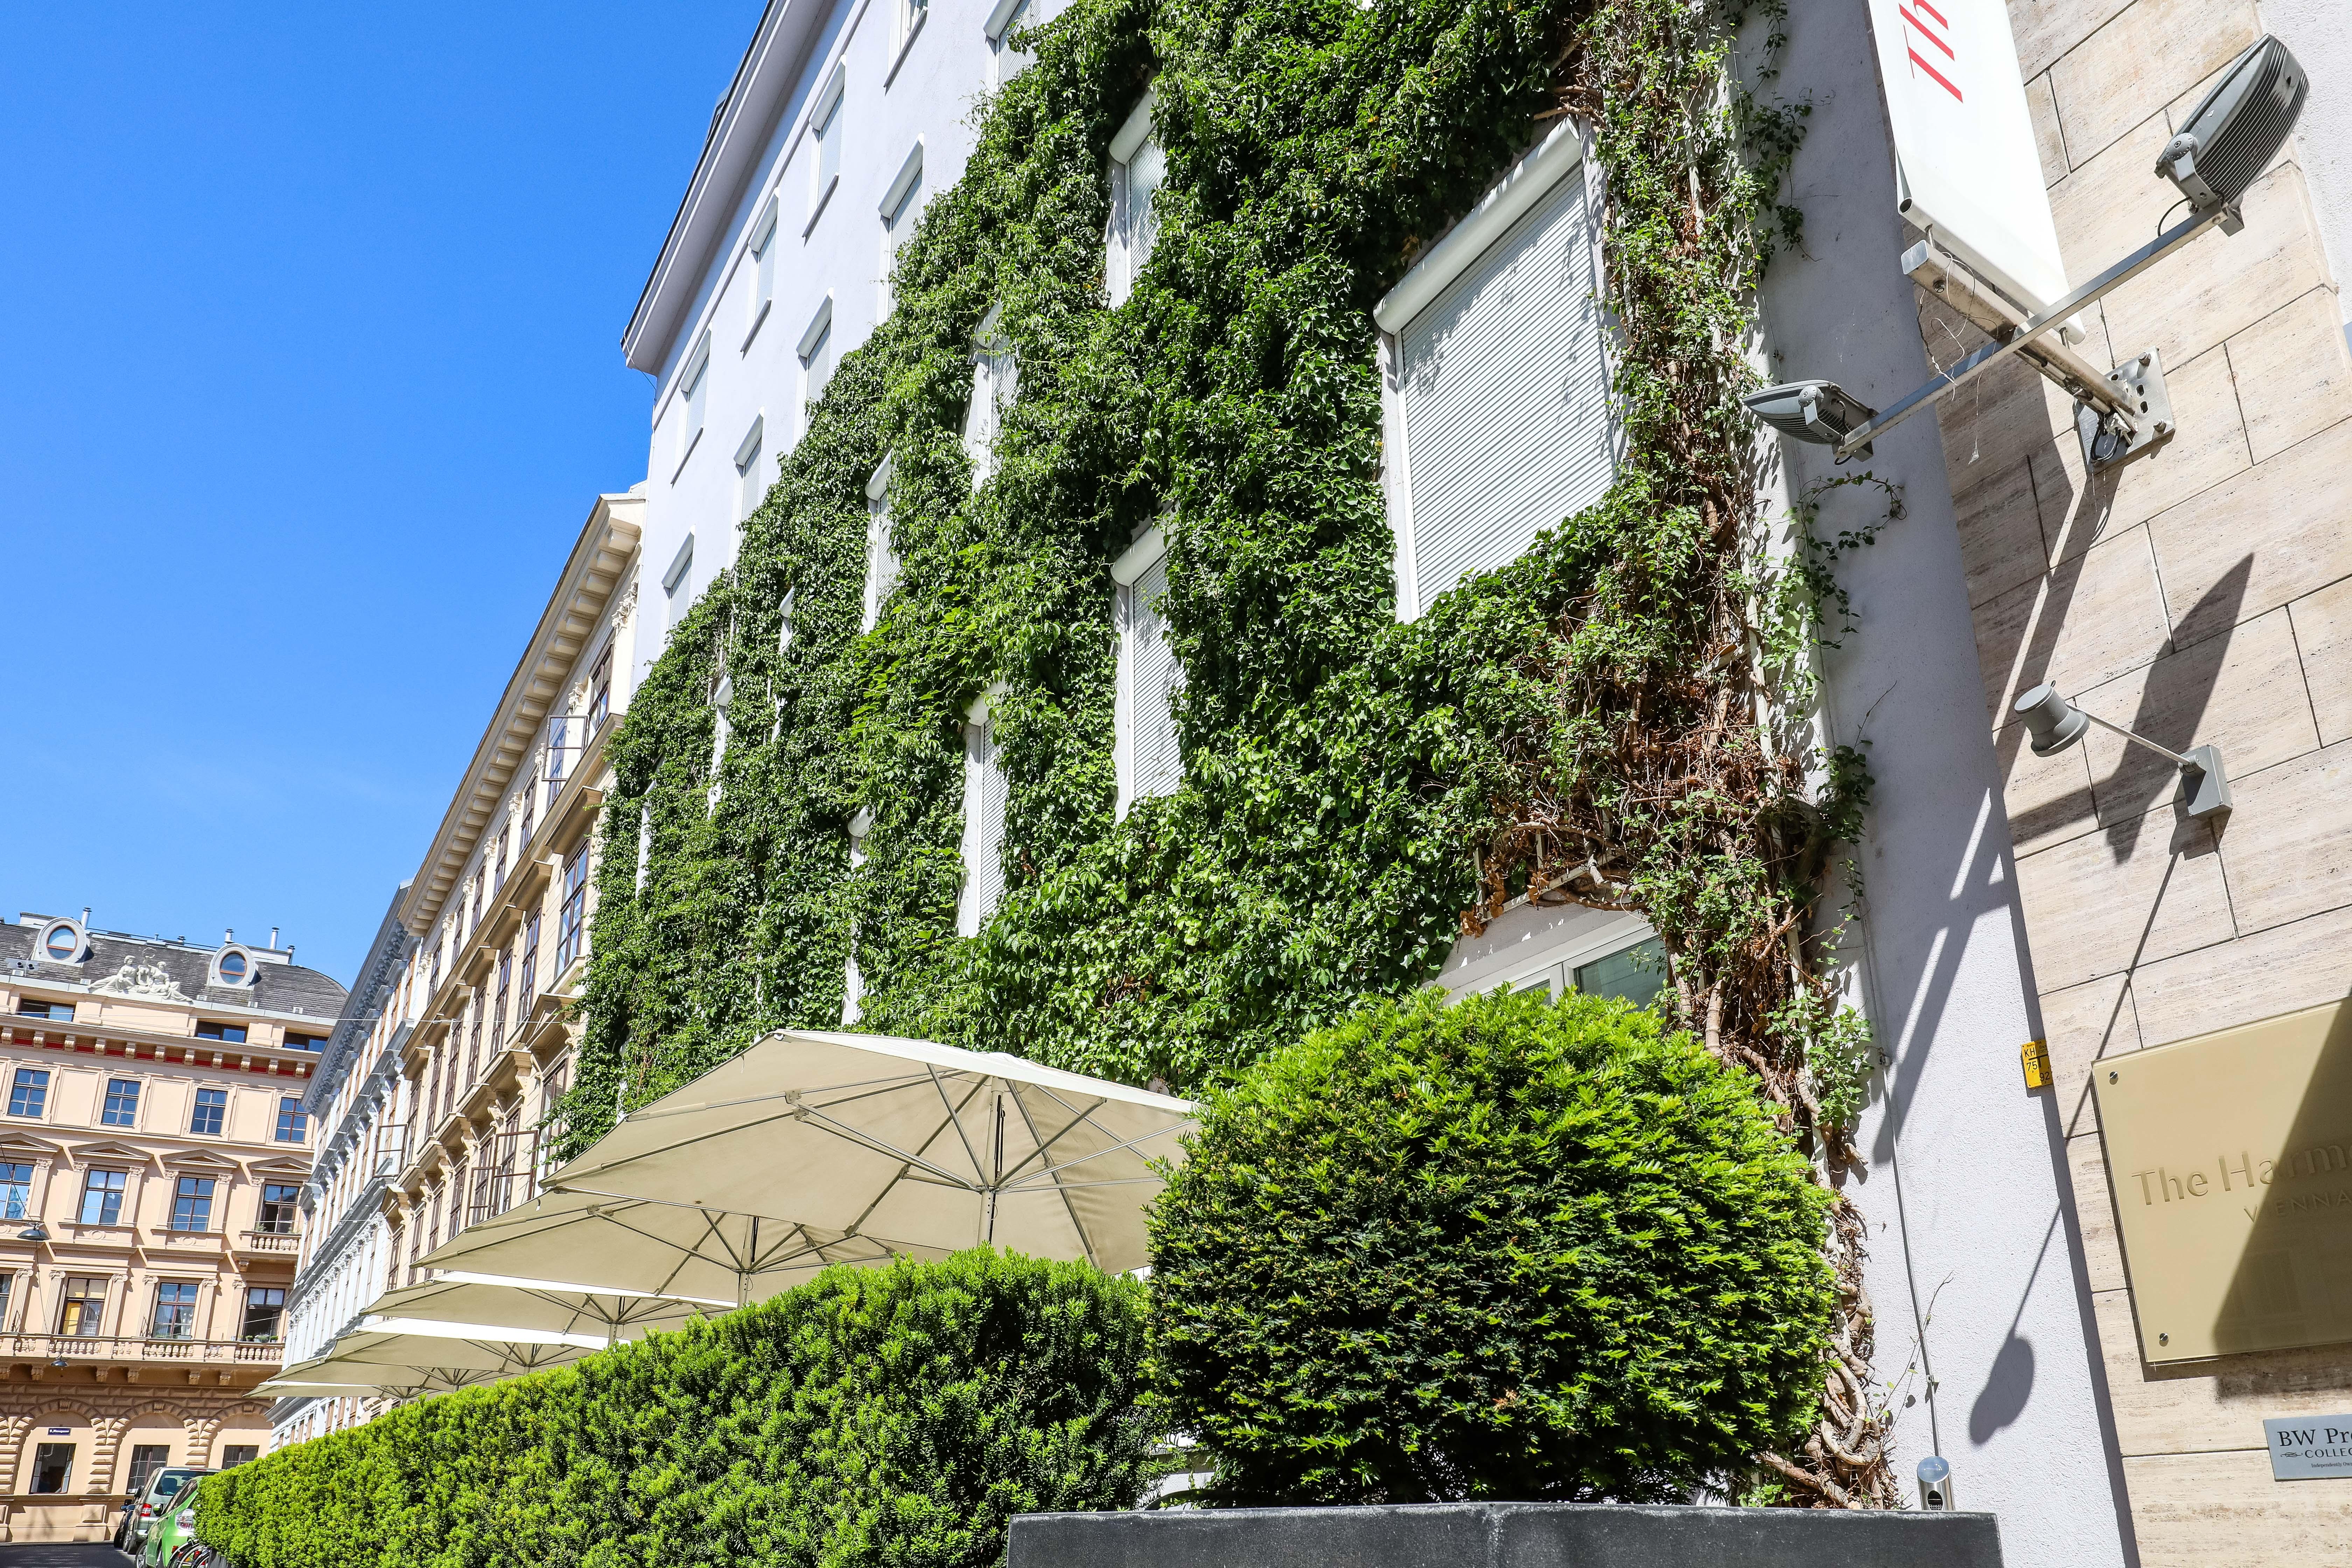 the city of Vienna green façade